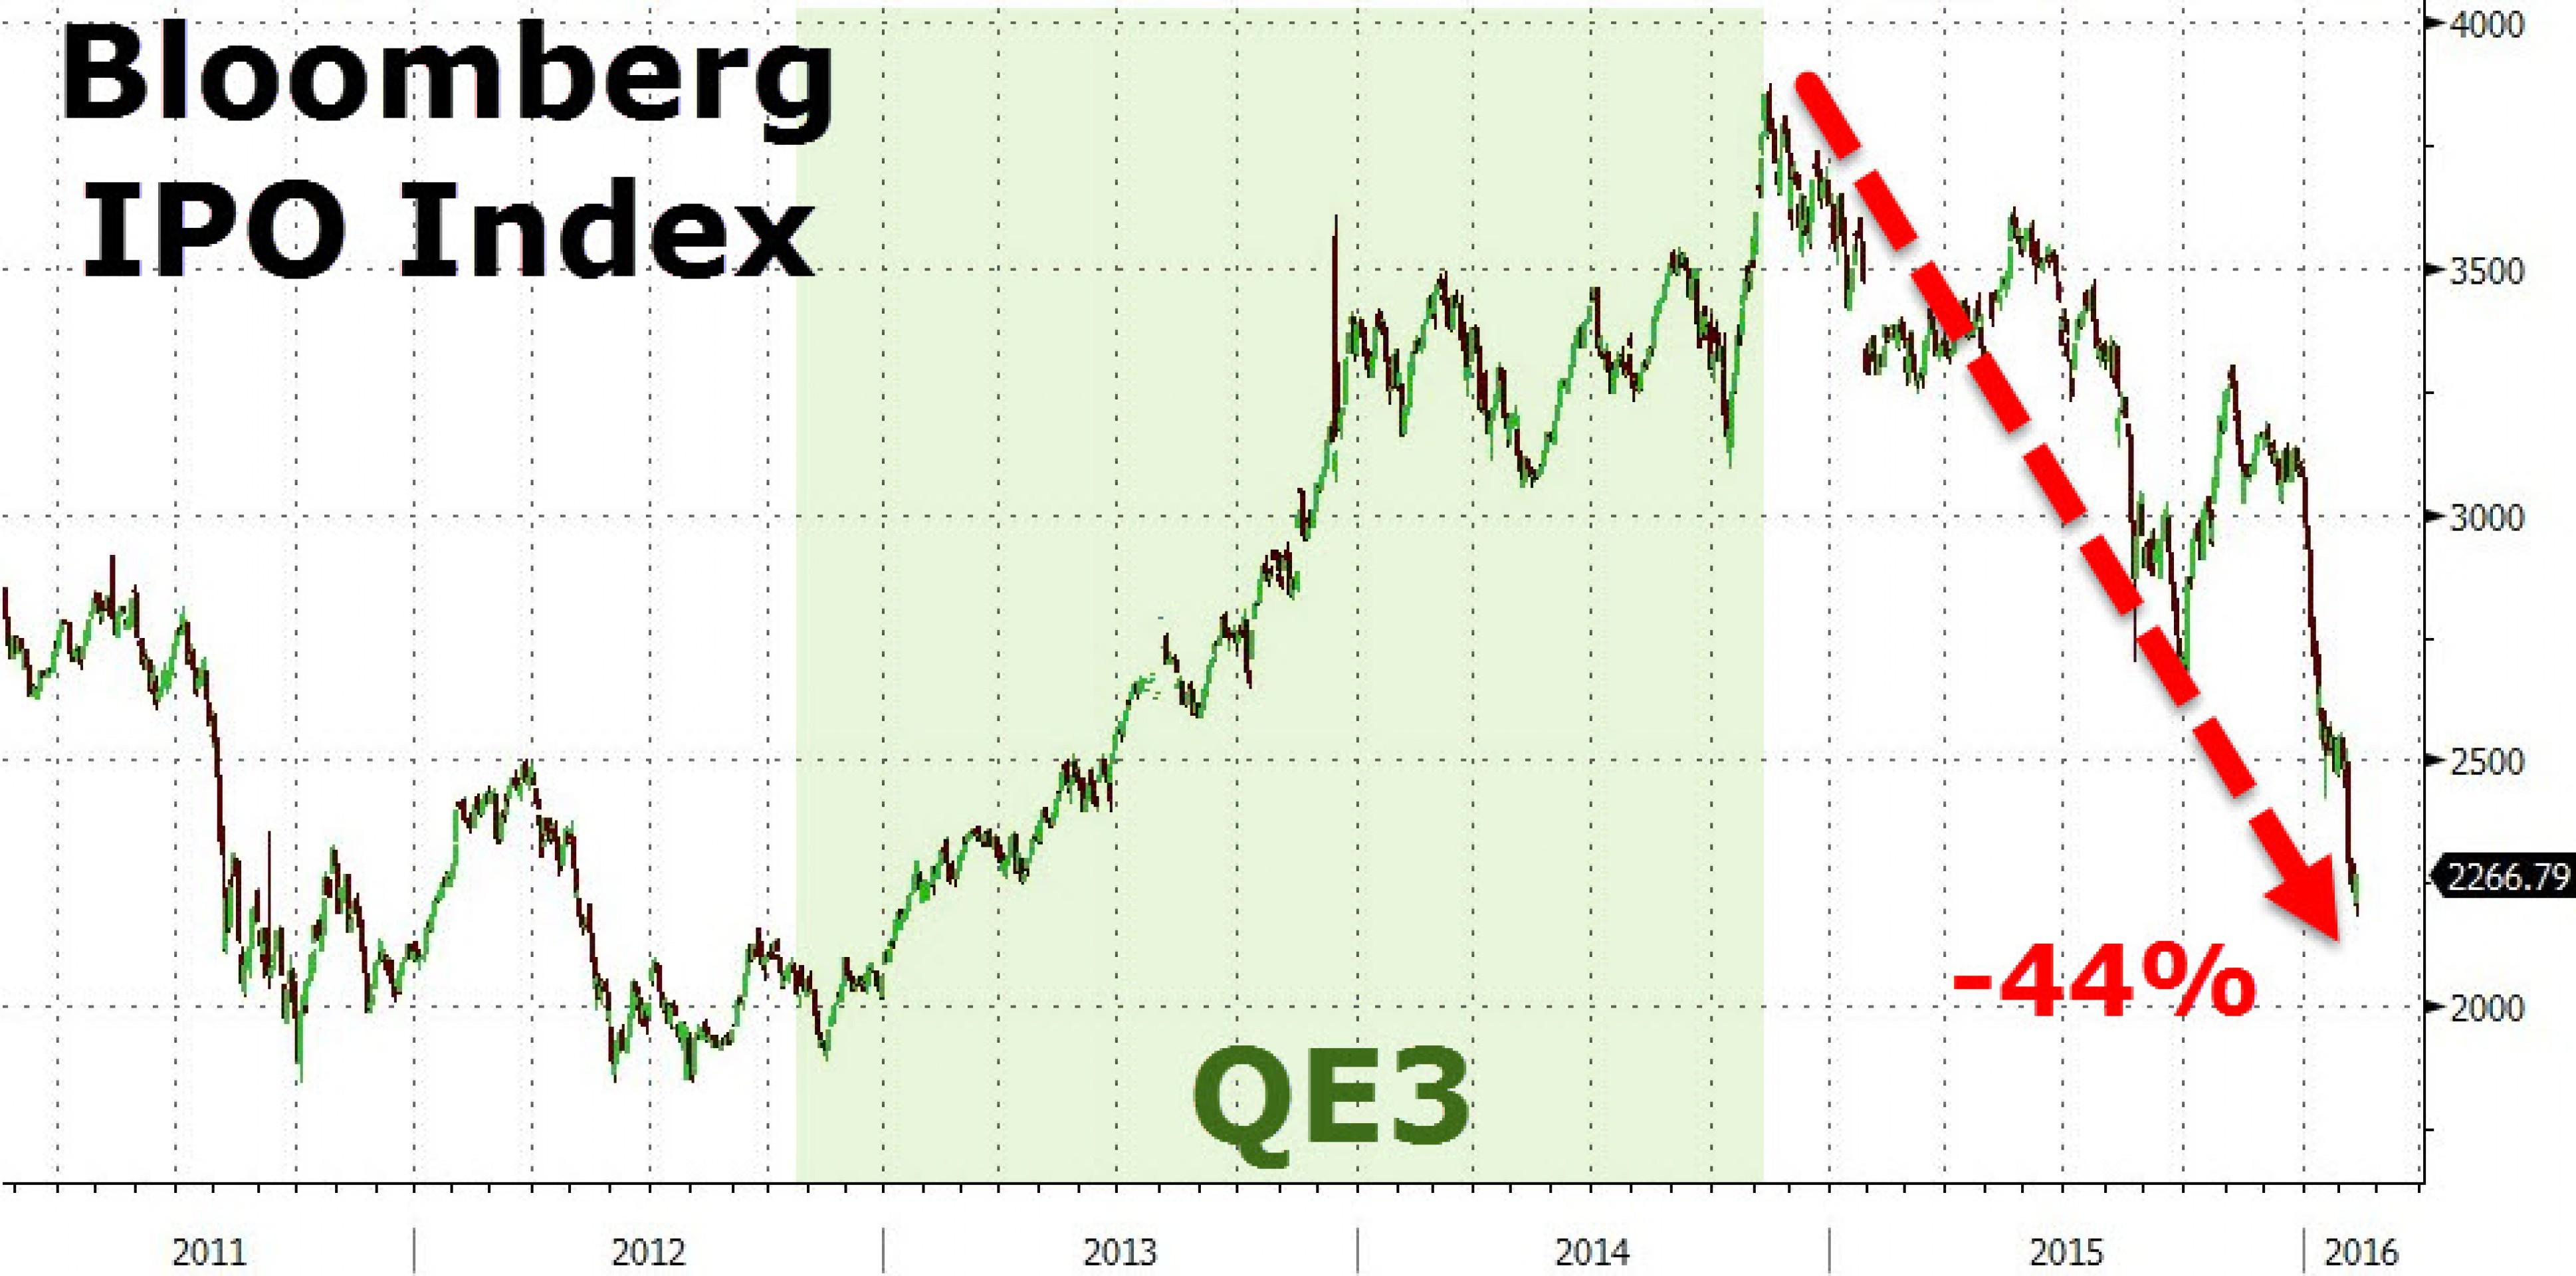 Рынок технологичных IPO умер?